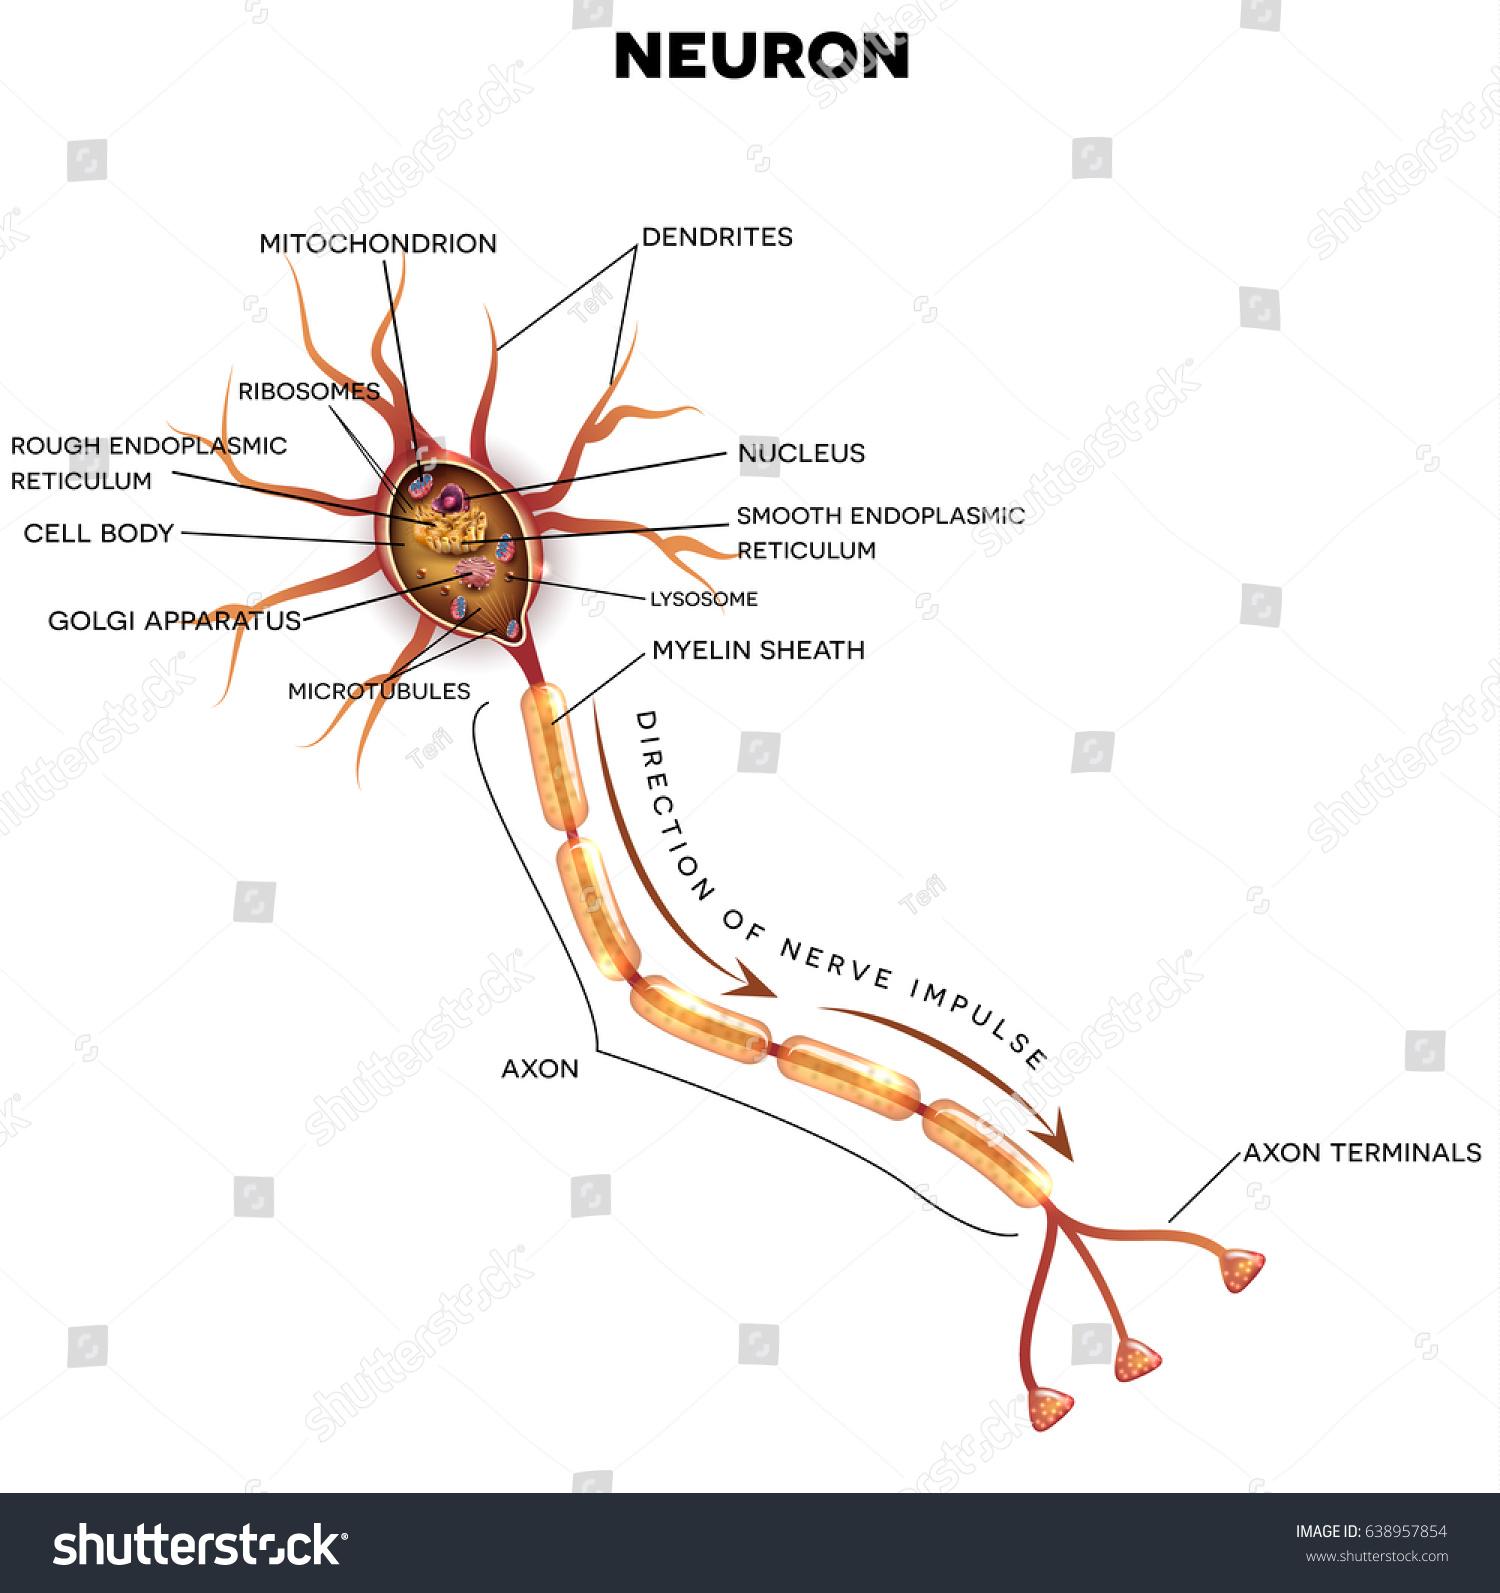 Neuron Nerve Cell That Main Part Stock Illustration 638957854